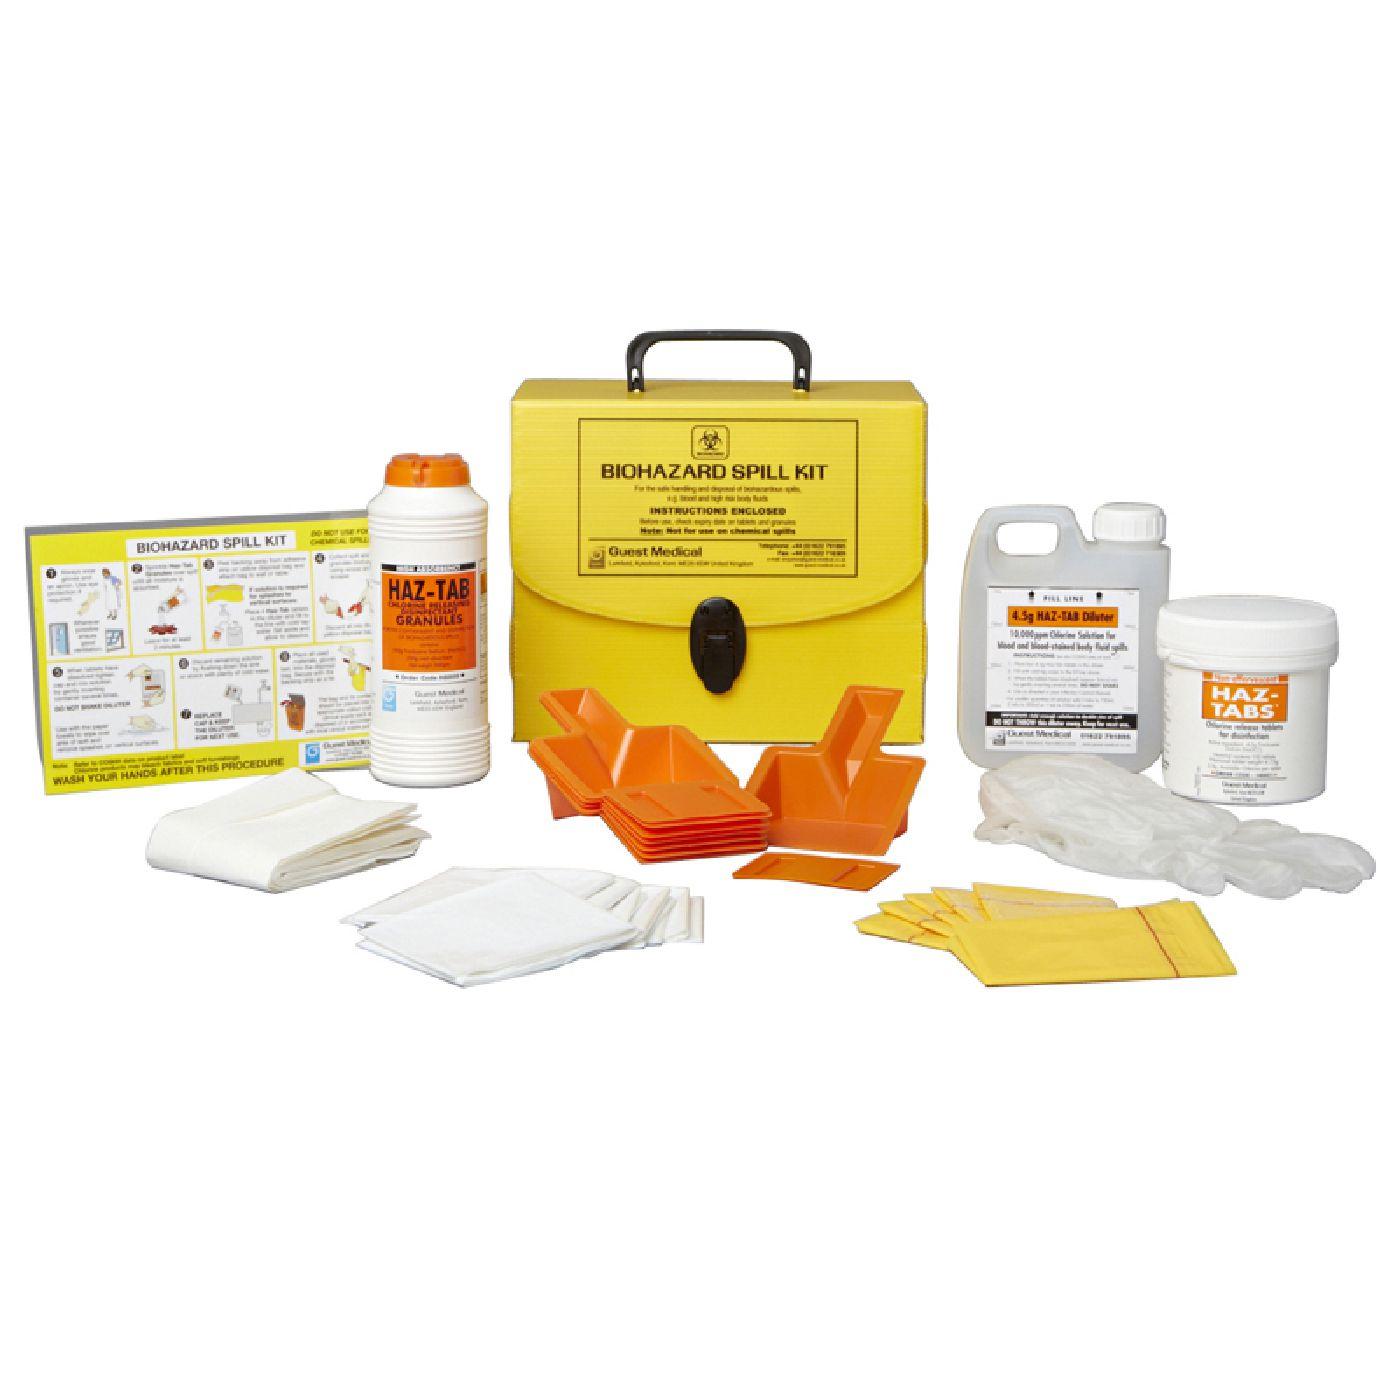 Bioscience Medical Supplies, Biomedical Equipment Suppliers in UAE